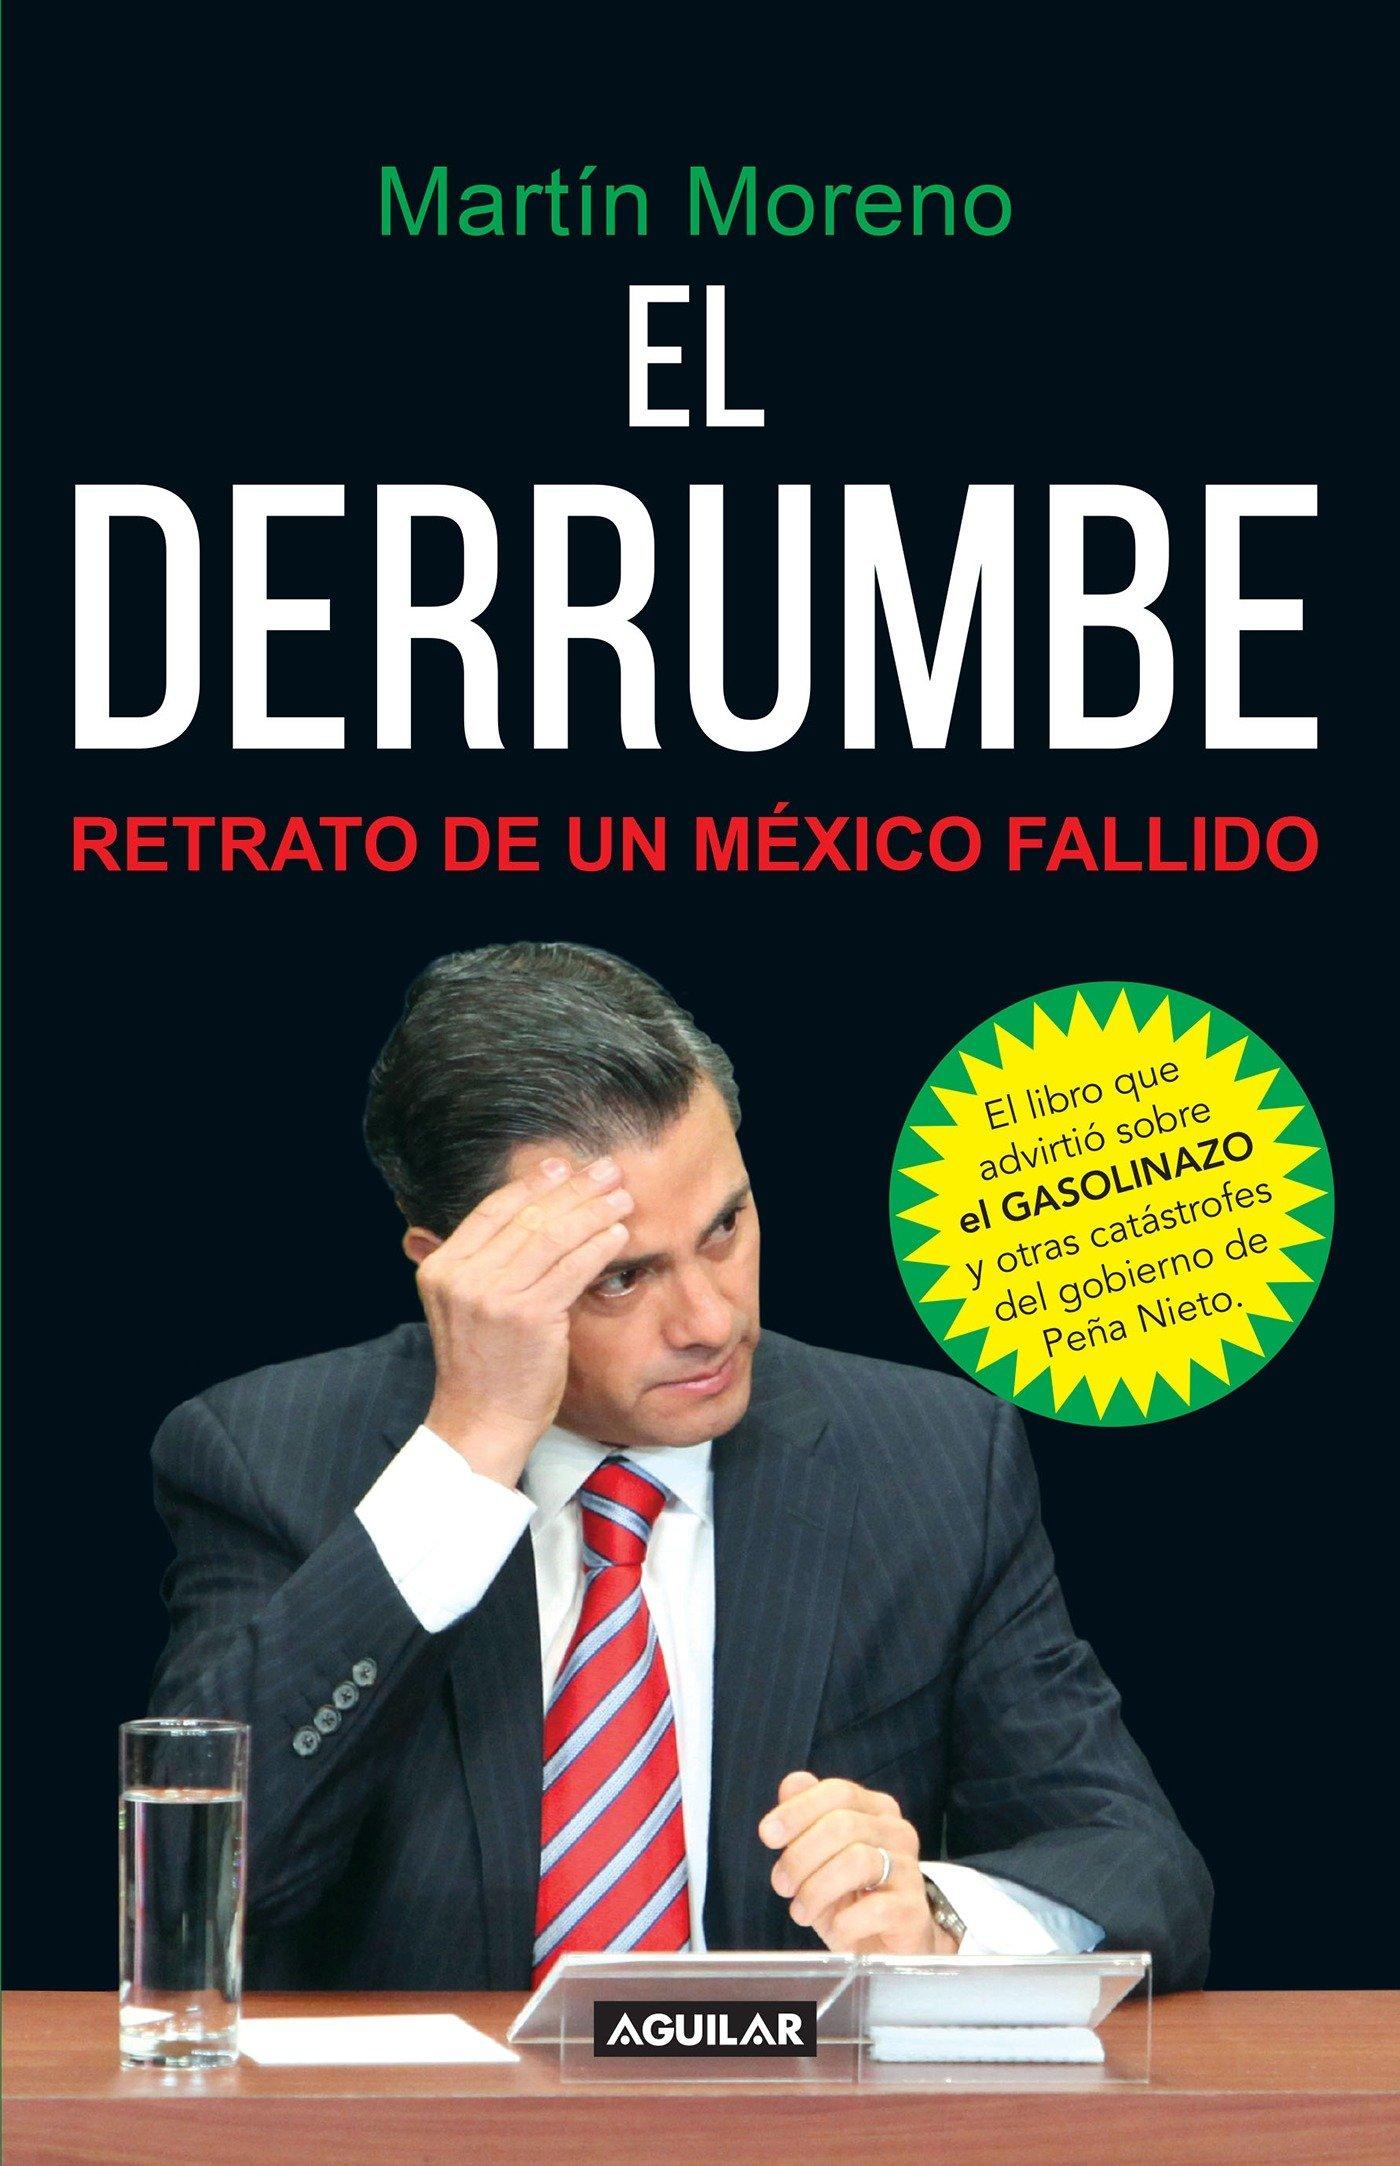 Download El derrumbe. Retrato de un Mexico fallido / The Debacle. Portrait of a Failed MX (Spanish Edition) pdf epub